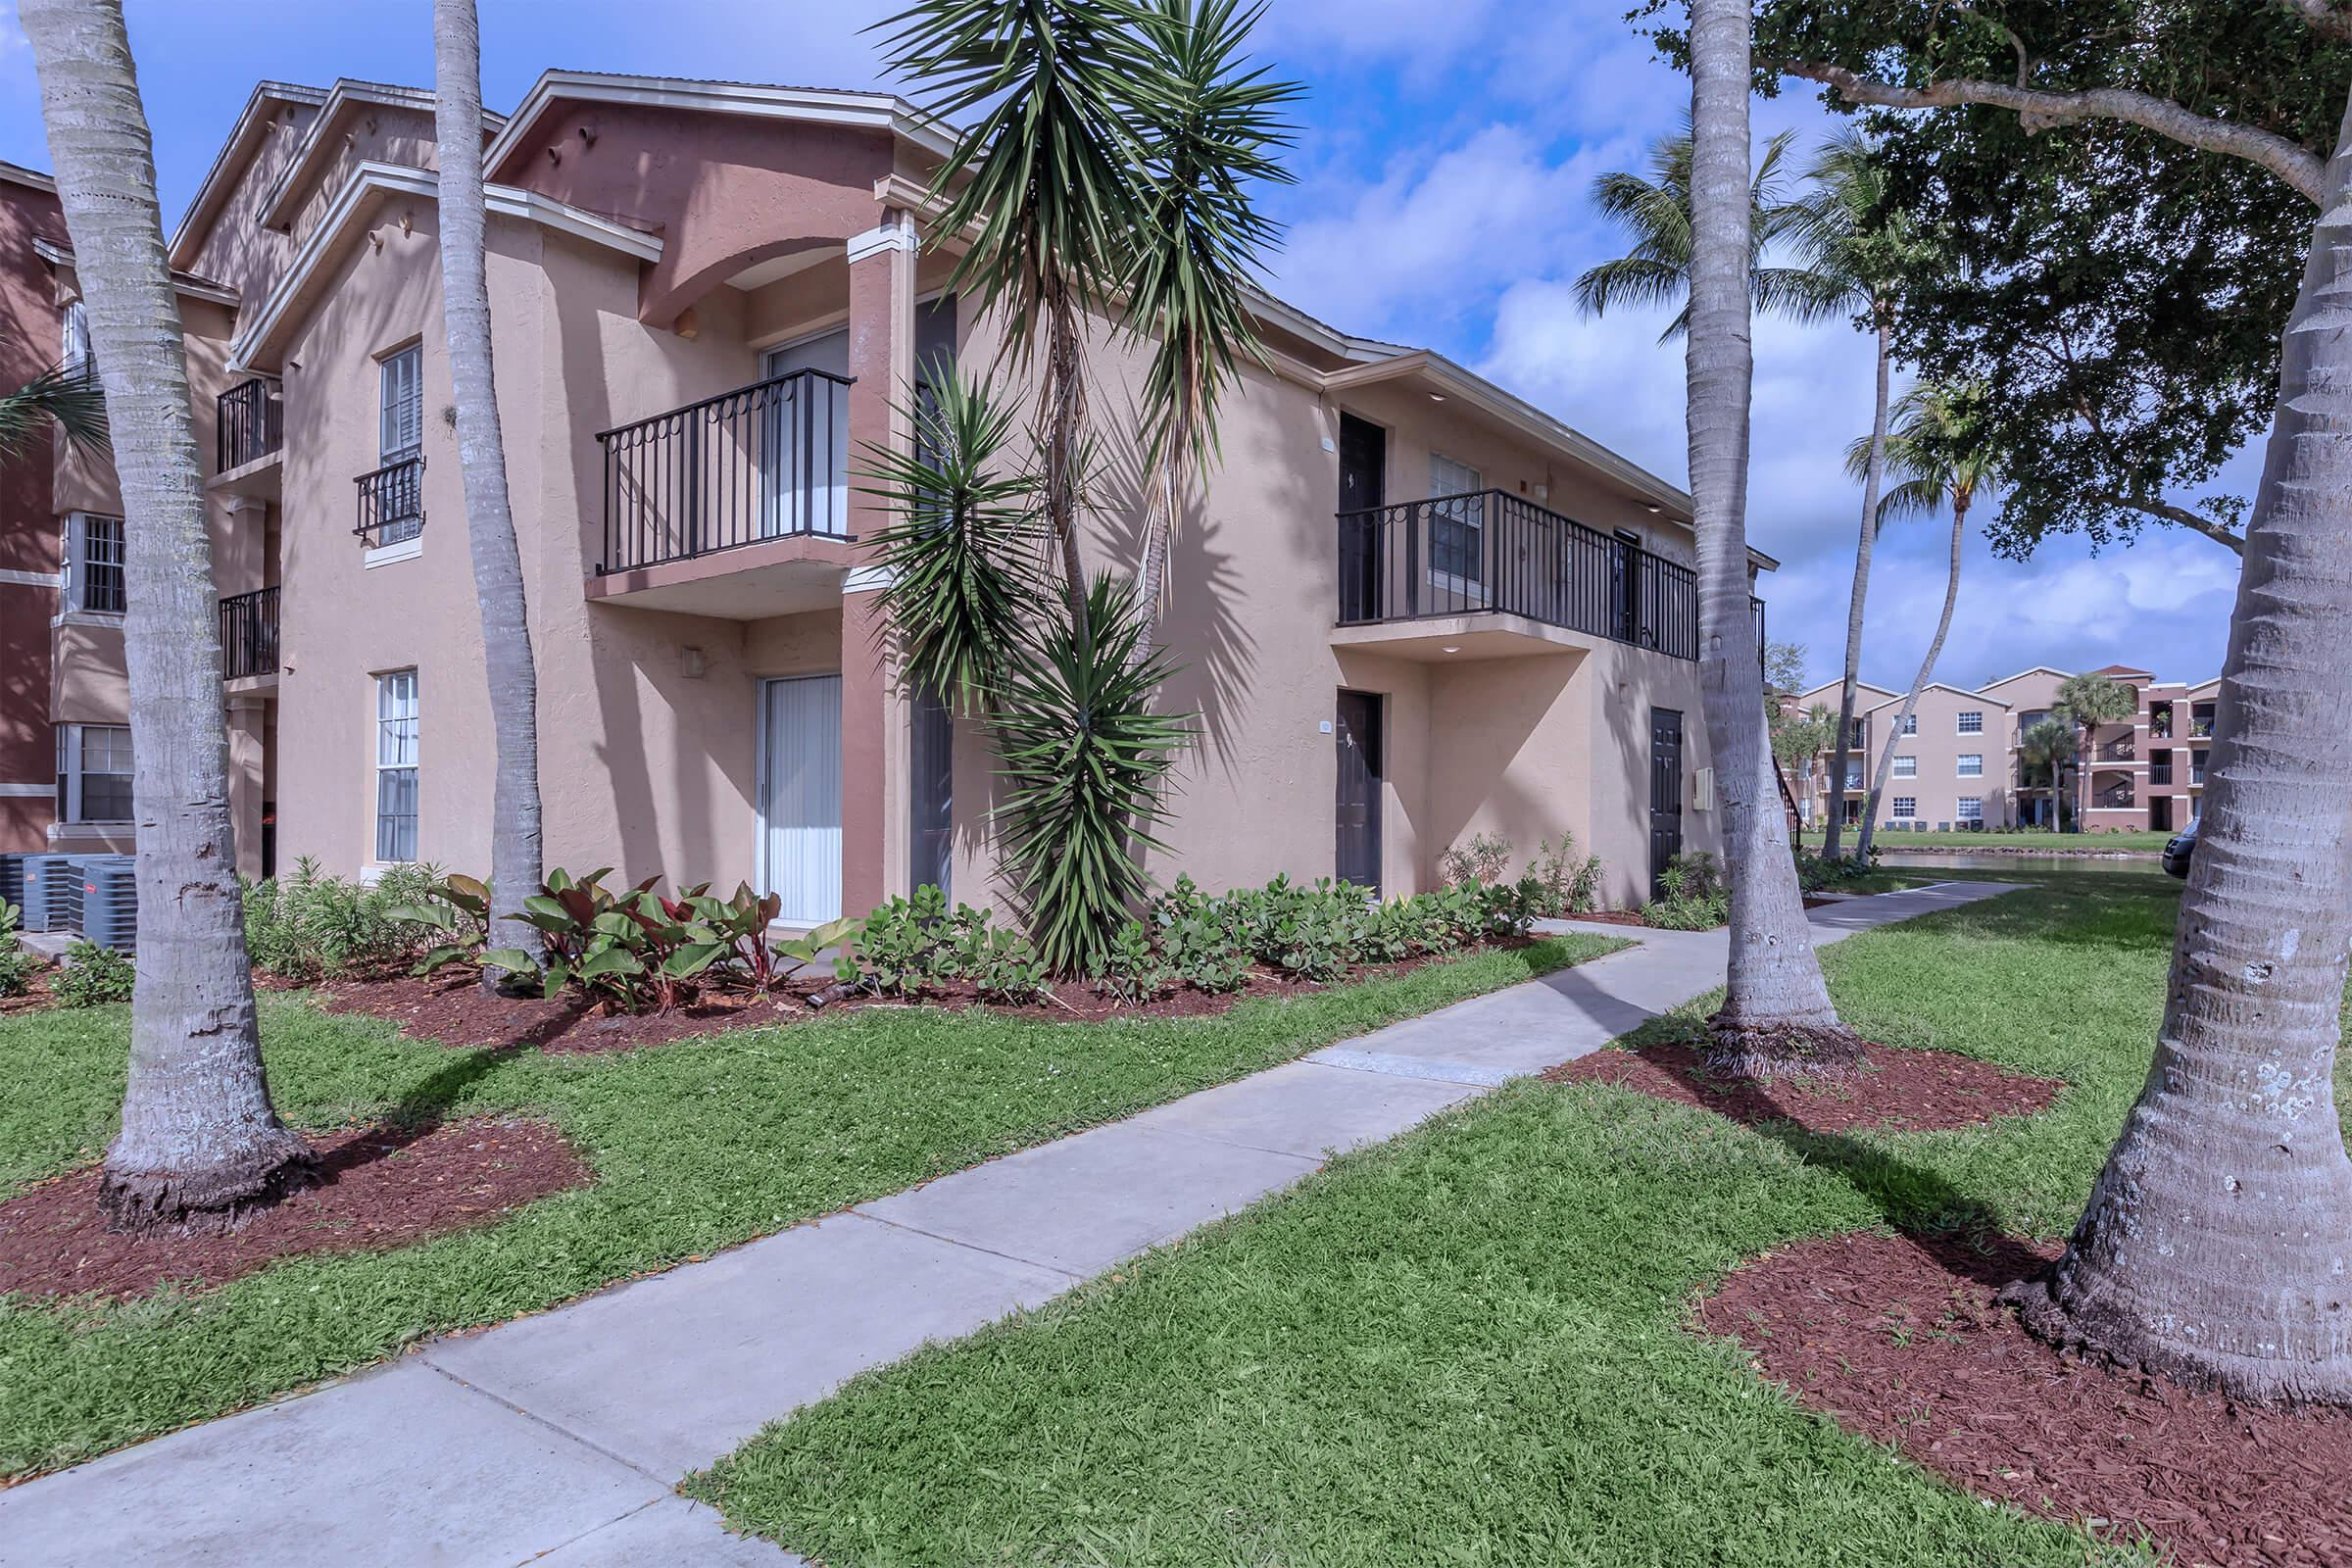 Beautiful Landscaping at Latitude Pointe Apartments in Boynton Beach, Florida